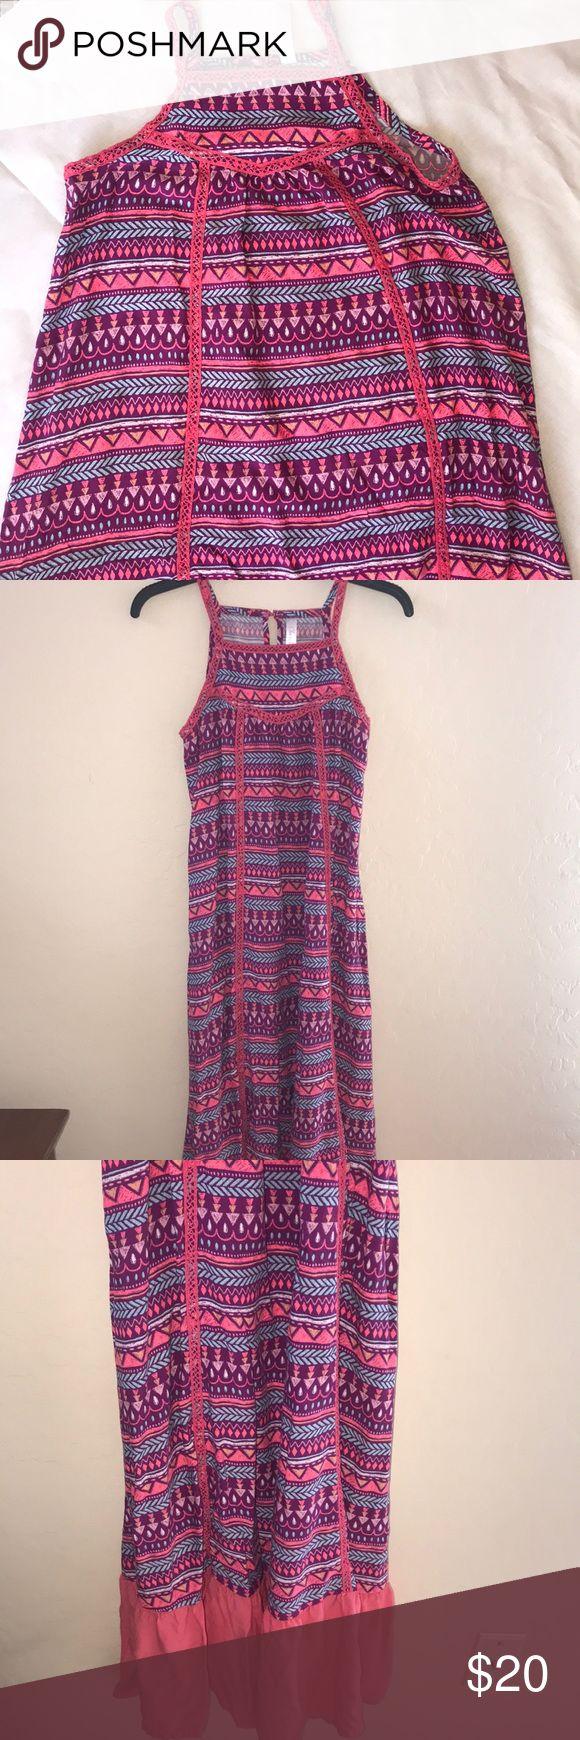 "Cherokee brand summer dress Cherokee brand summer dress Cute good condition  SIZE XL 14-16 armpit to armpit 17 Length 45"" Cherokee Dresses Maxi"